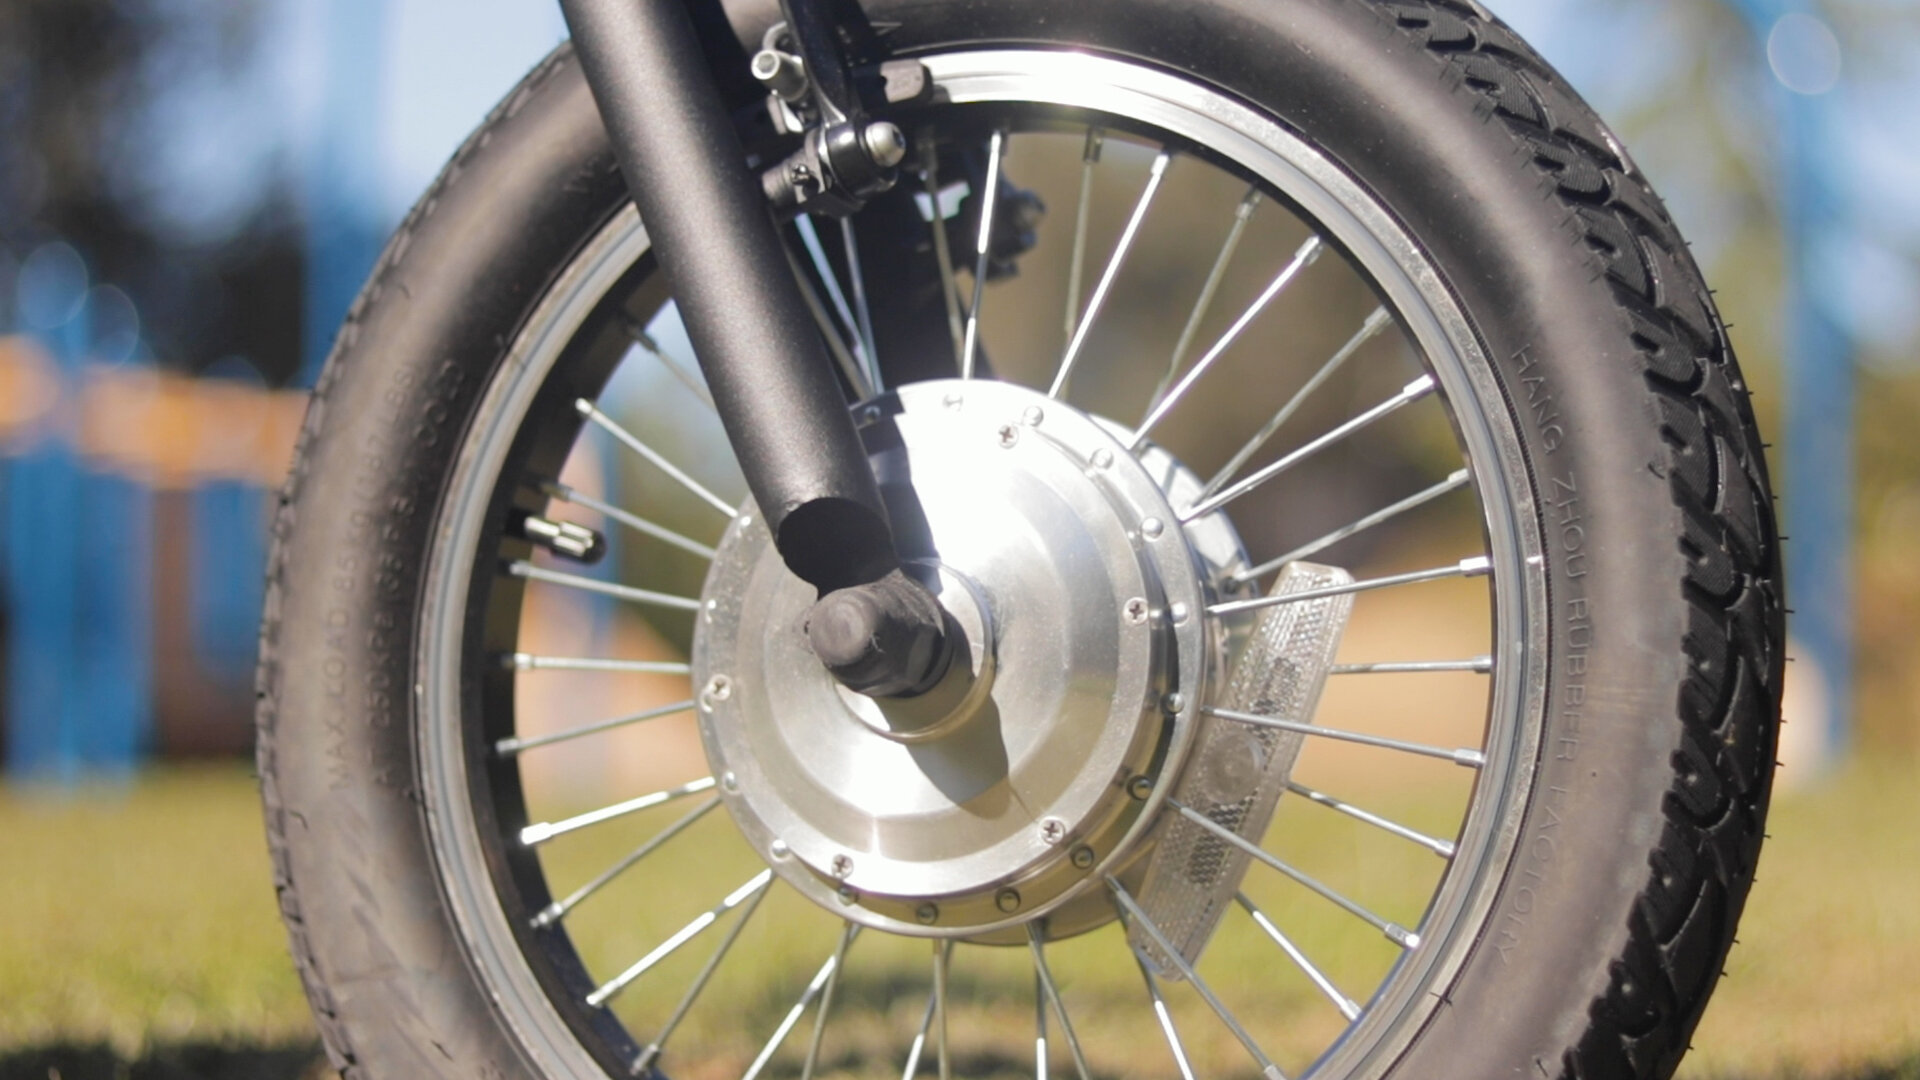 gotrax-shift-s1-electric-bike-review-2019-motor.jpg